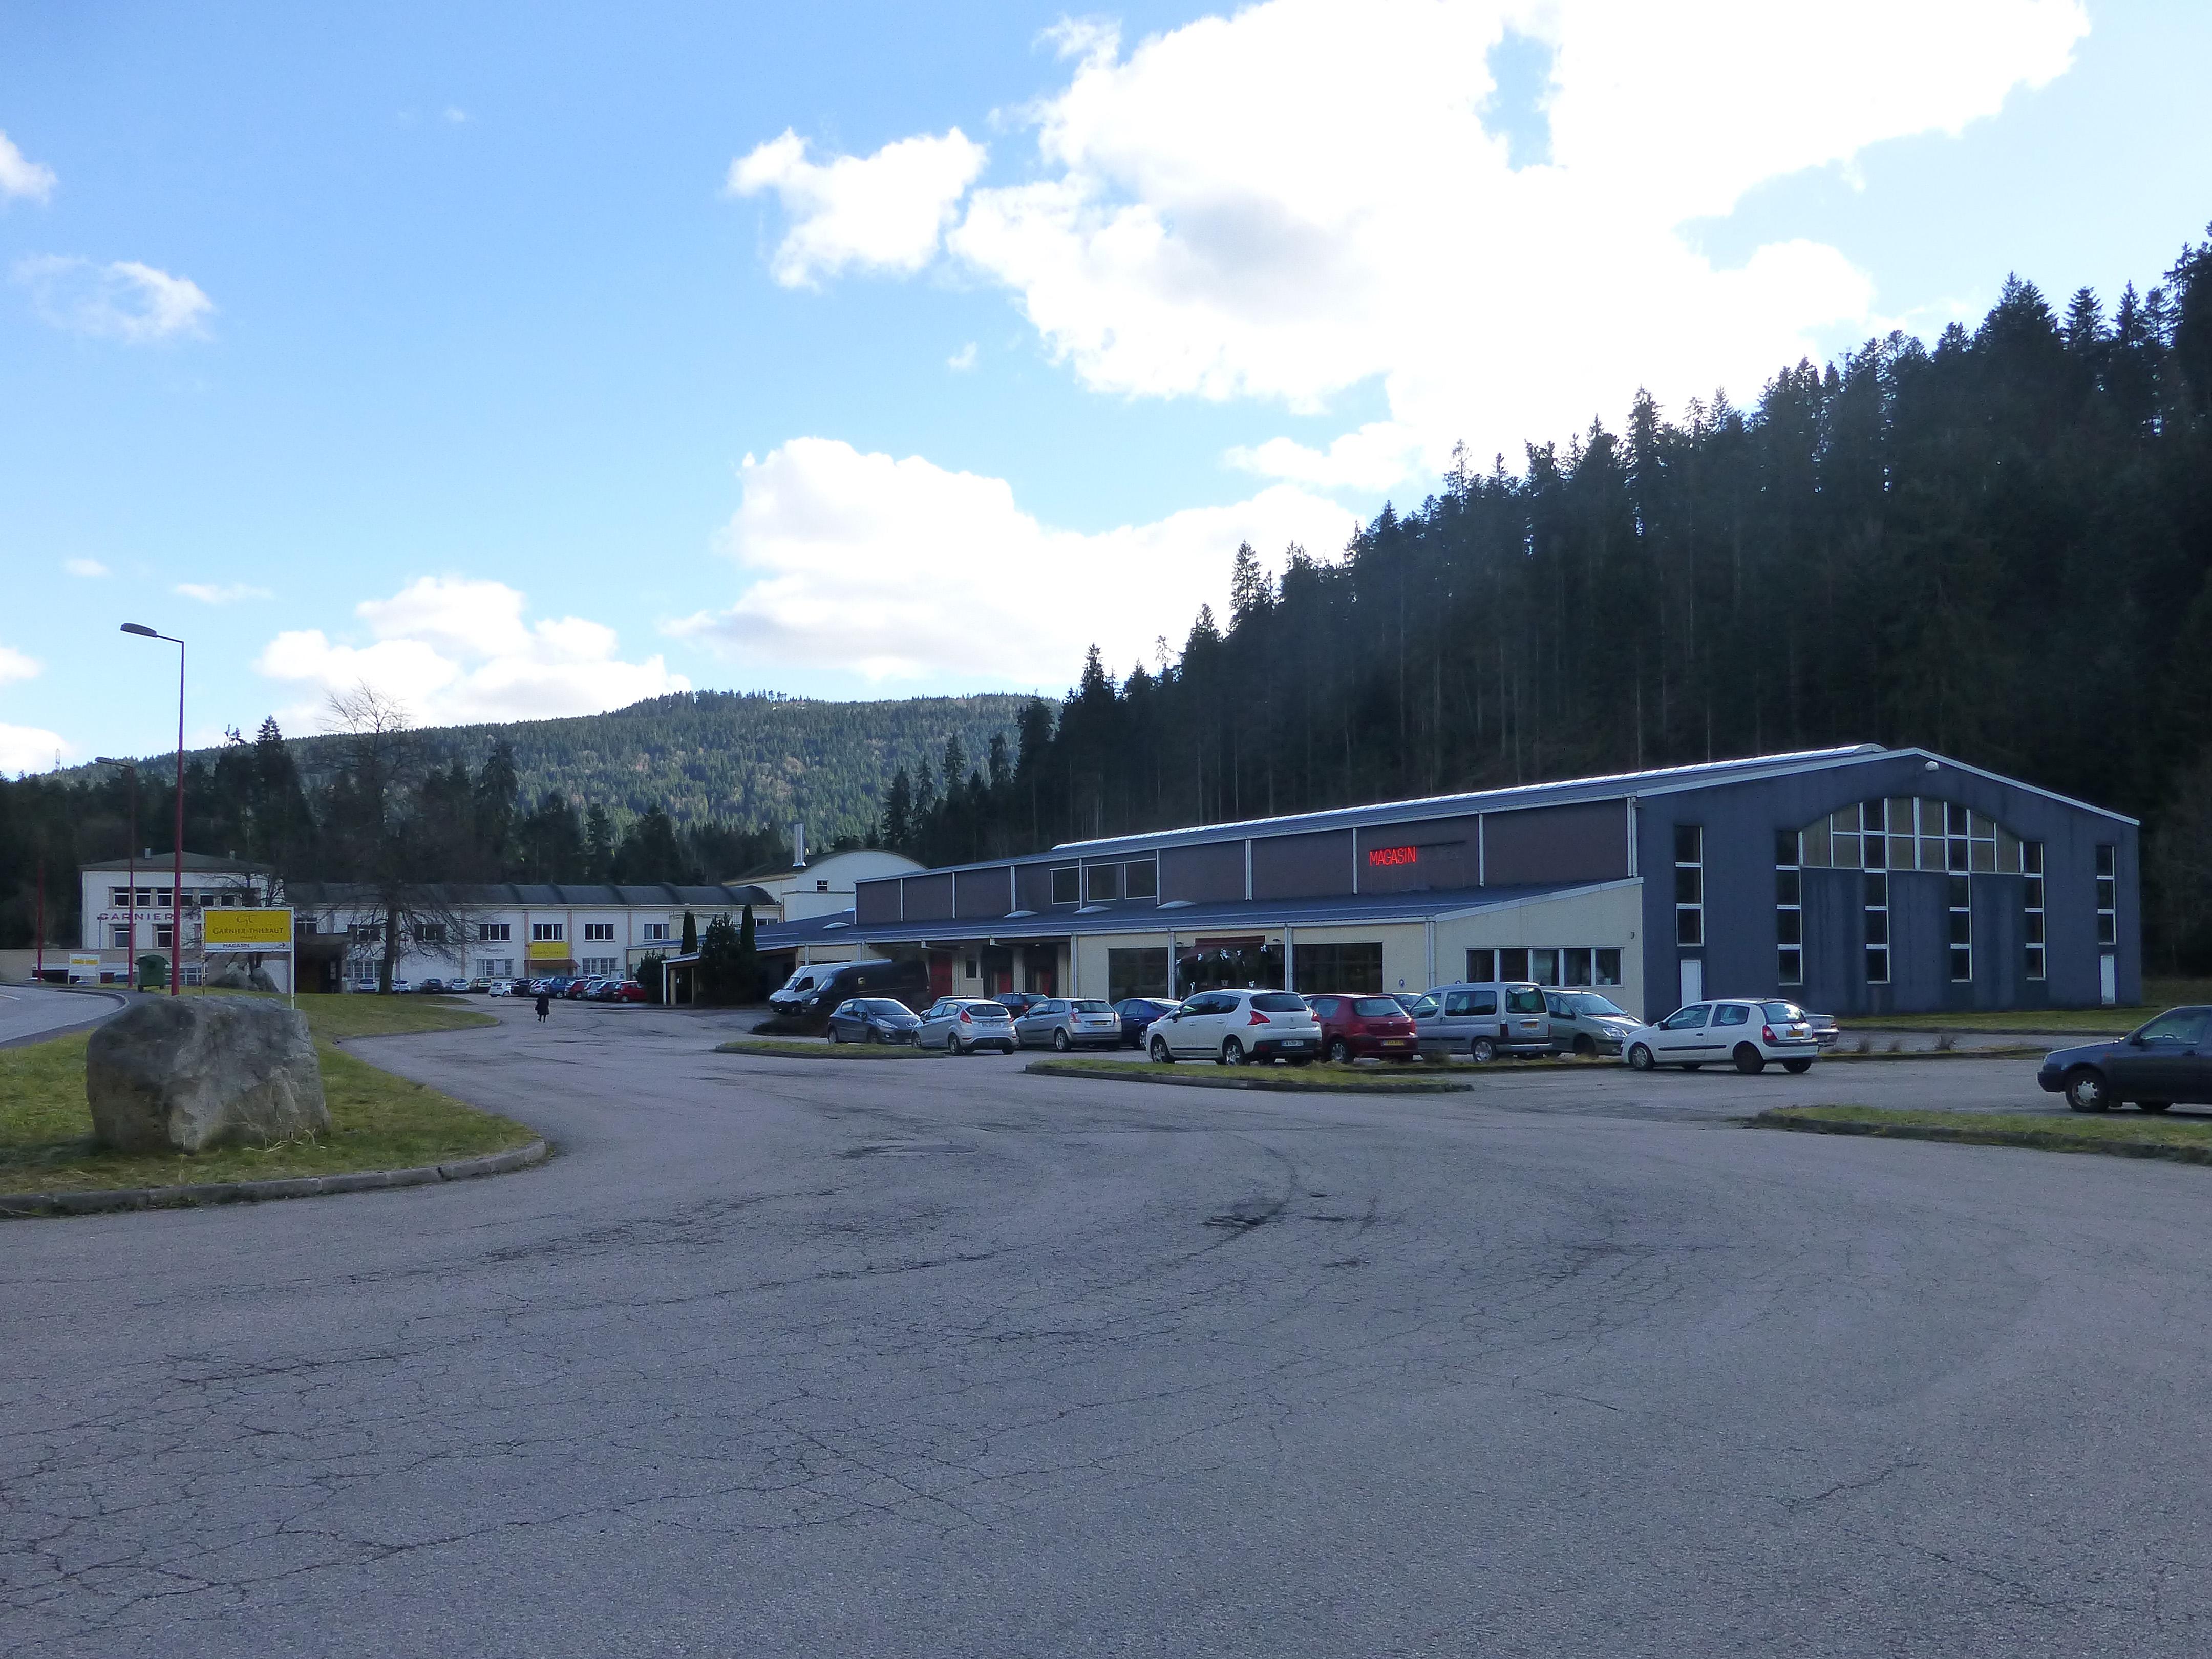 File kichompr usine et magasin garnier thi baut 2 jpg wikimedia commons - Garnier thiebaut magasin d usine ...